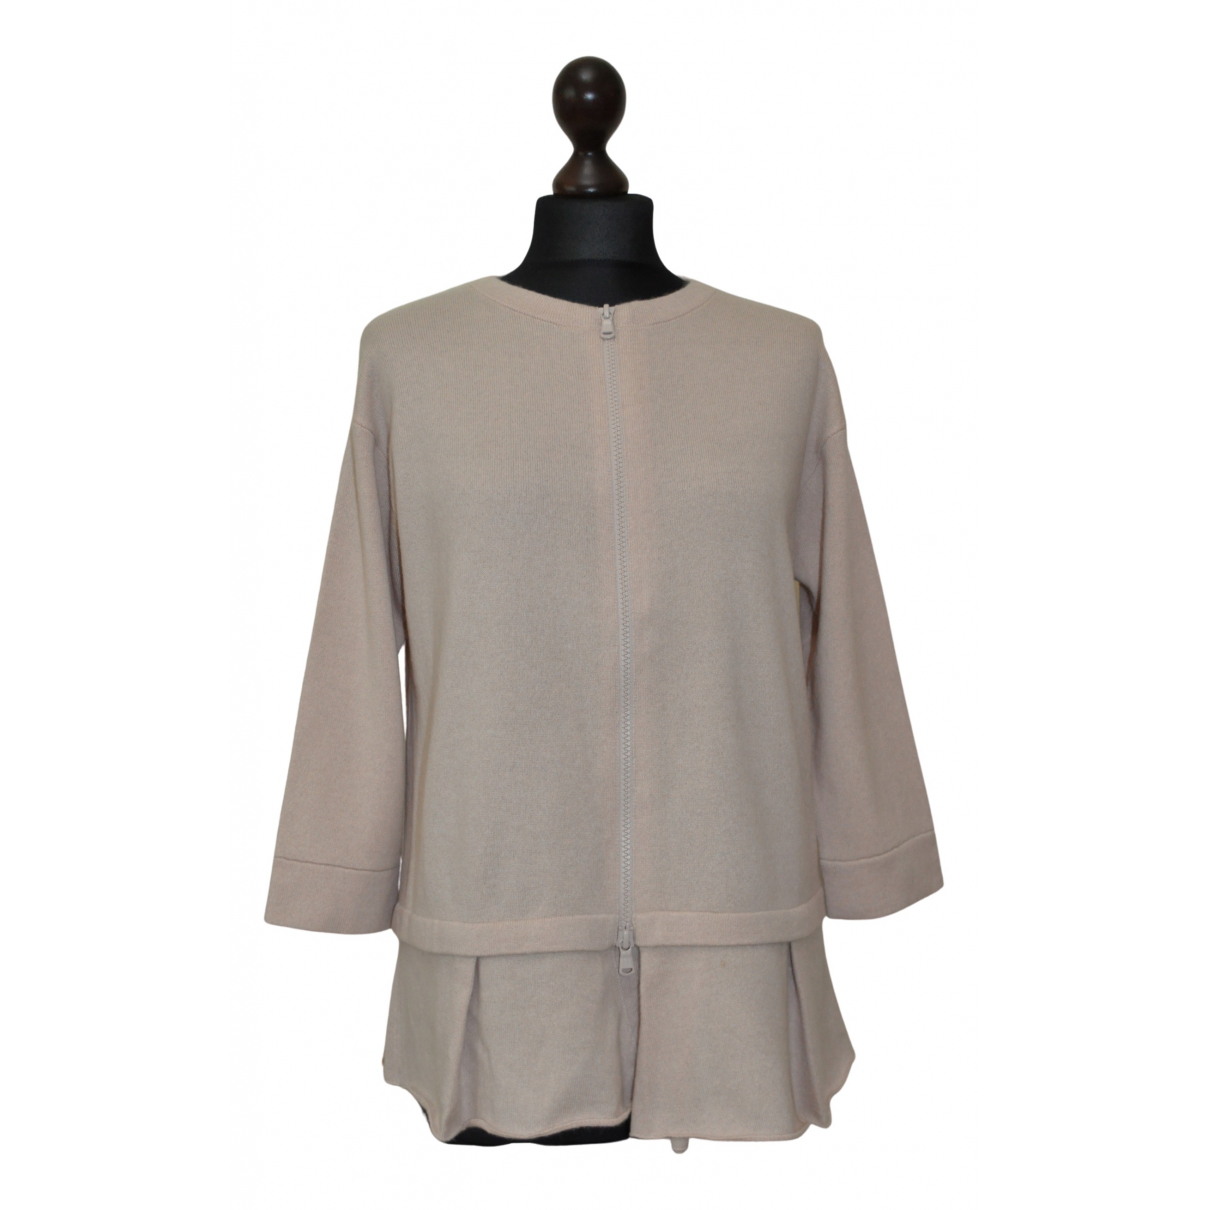 Brunello Cucinelli N Beige Cashmere Knitwear for Women M International